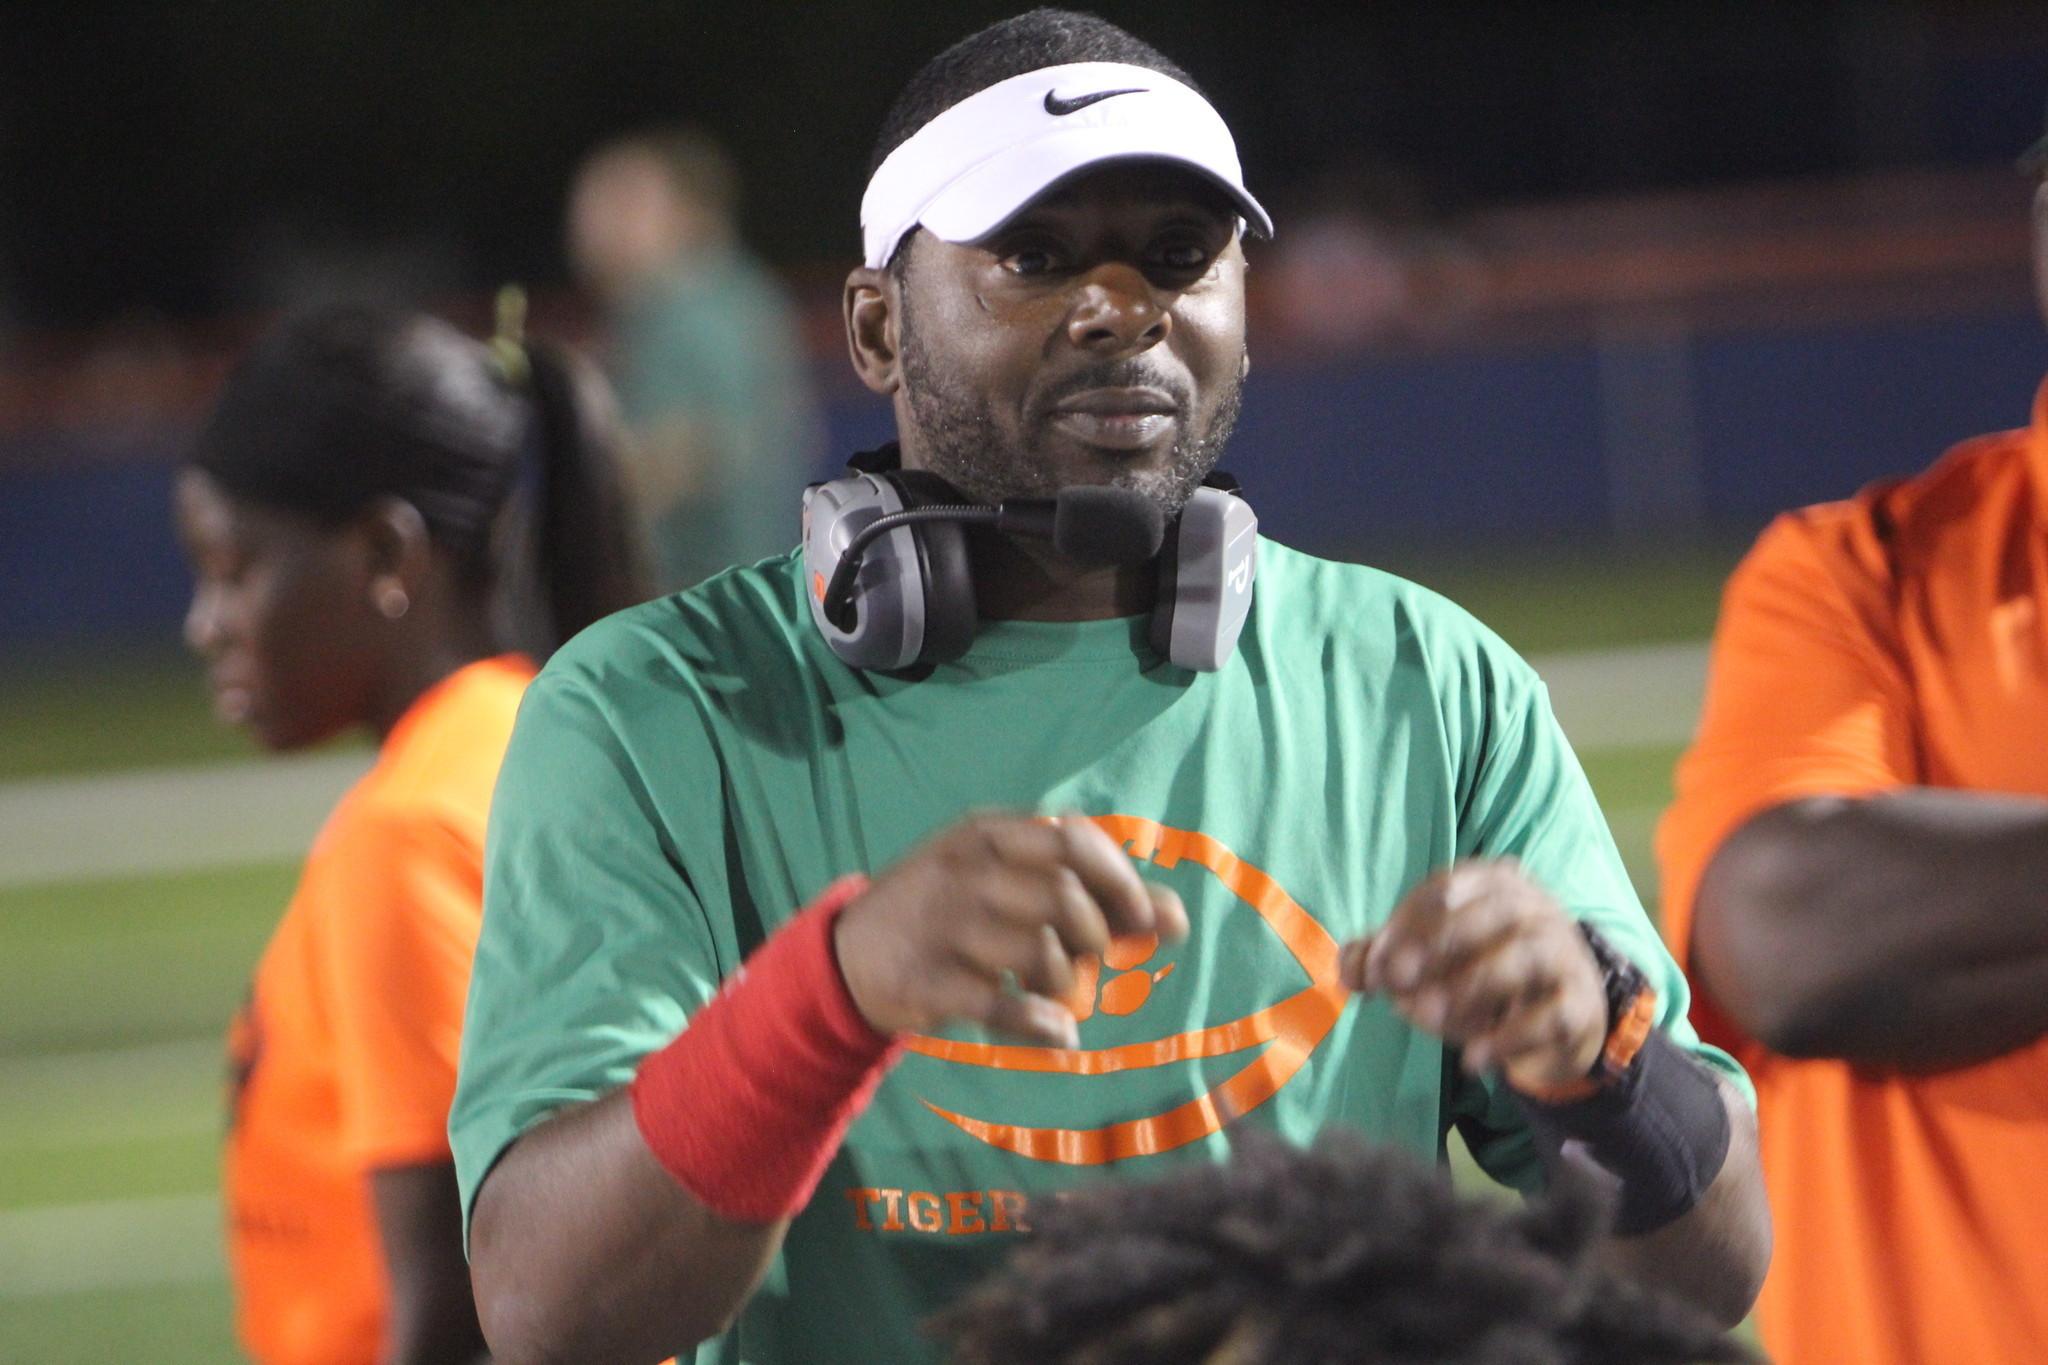 Ucf New Head Coach >> Elijah Williams puts the fight back in Jones High Fightin' Tigers - Orlando Sentinel